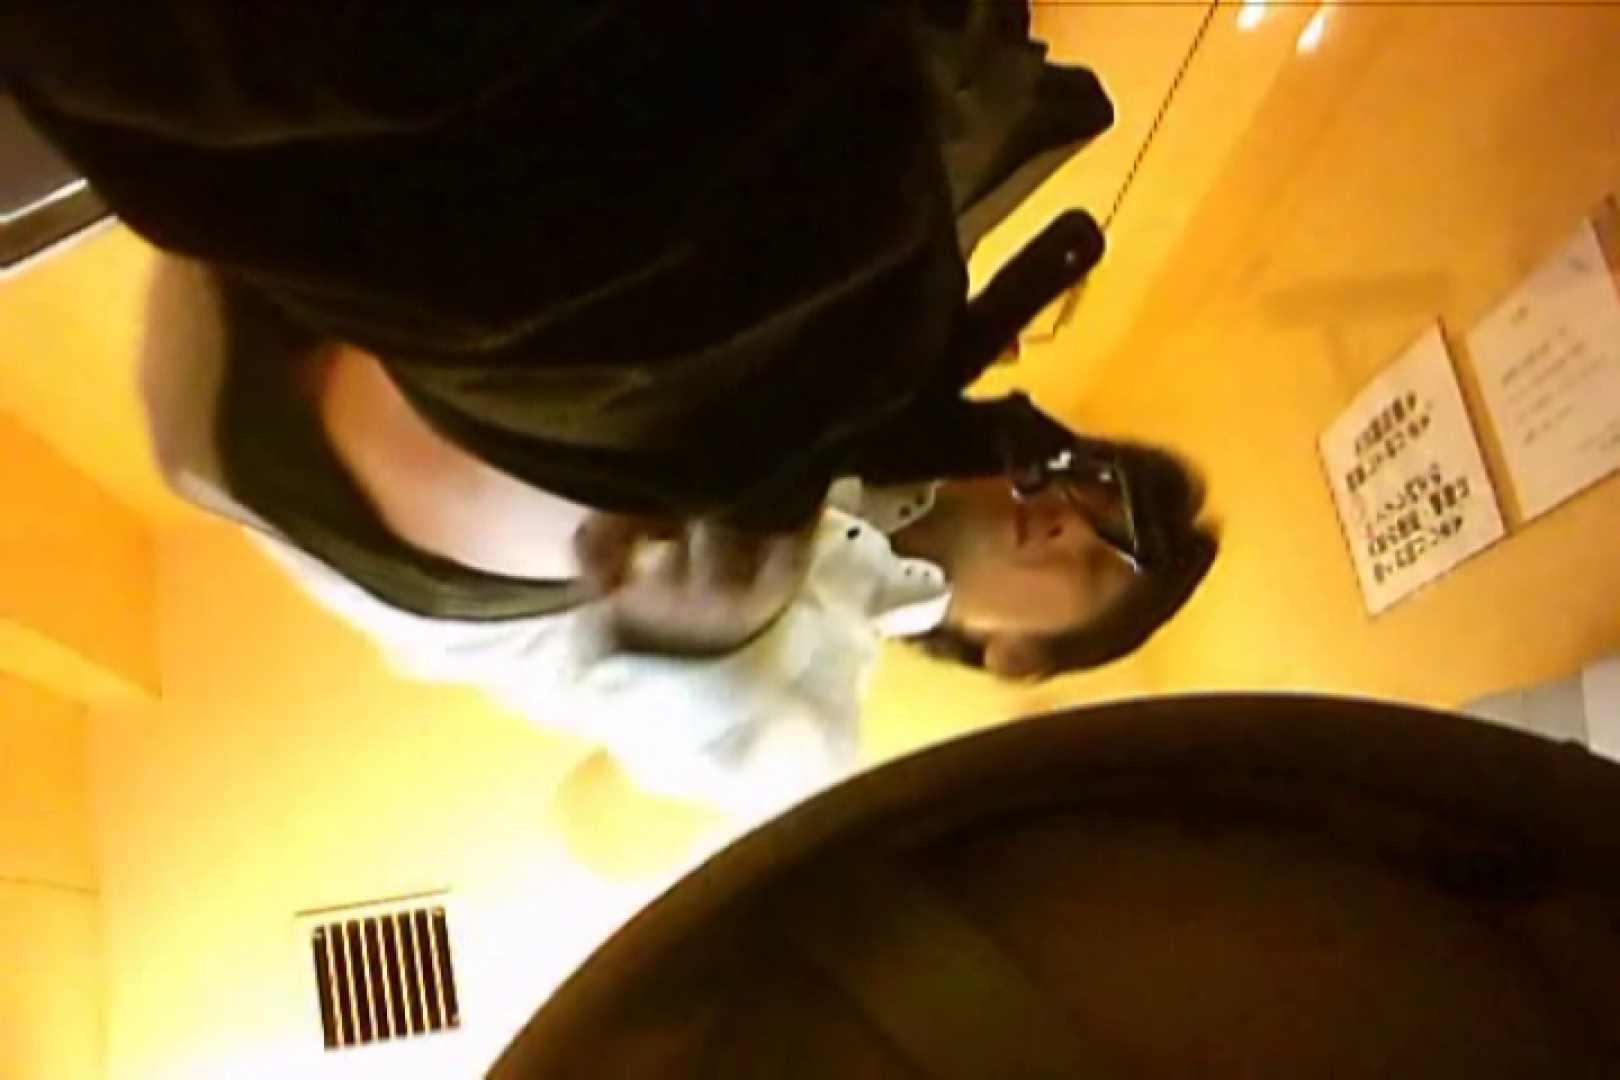 SEASON 2ND!掴み取りさんの洗面所覗き!in新幹線!VOL.03 スーツボーイズ | ボーイズ私服  76pic 28